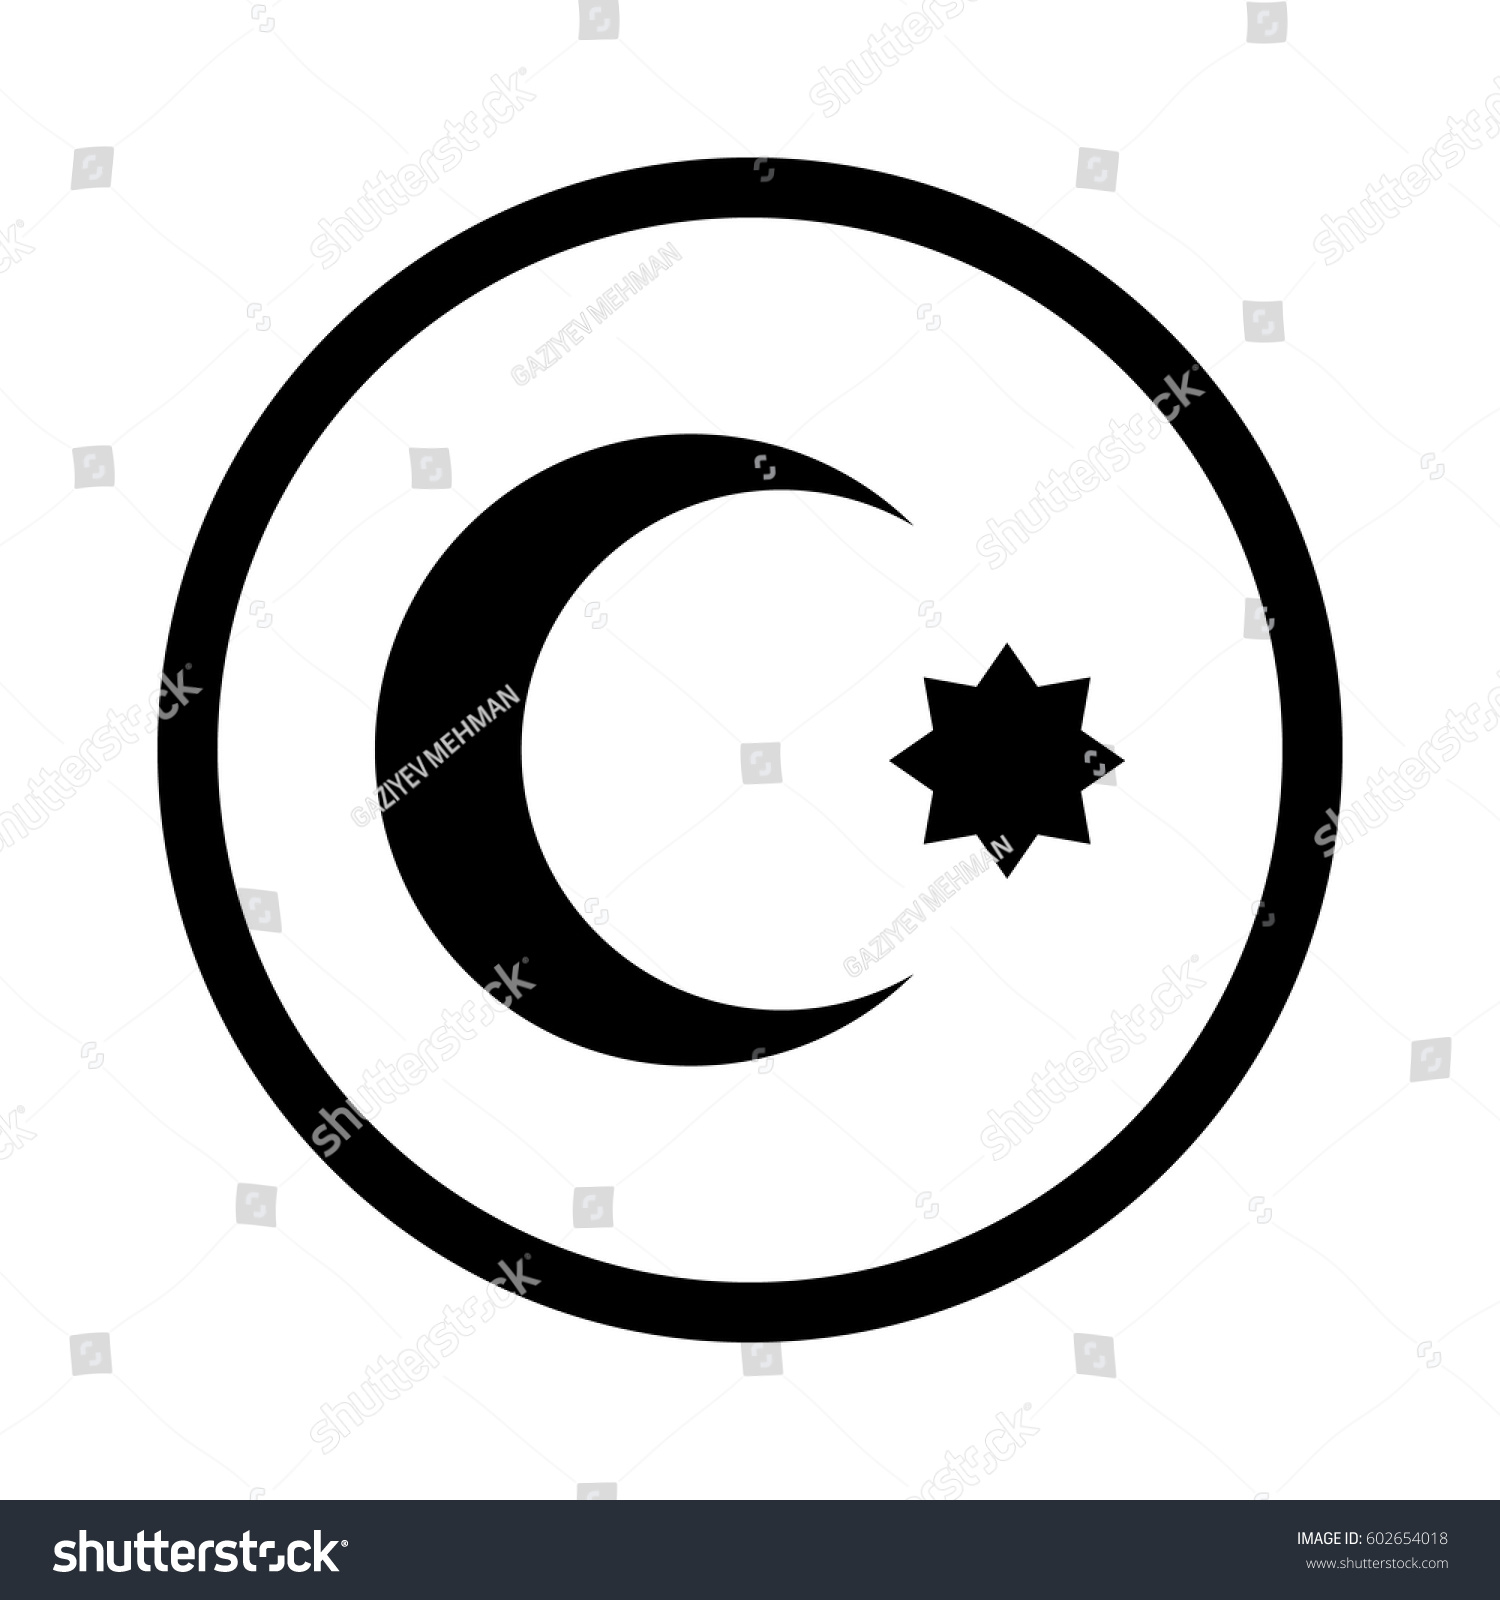 Symbol islam star crescent stock vector 602654018 shutterstock symbol of islam star and crescent buycottarizona Gallery